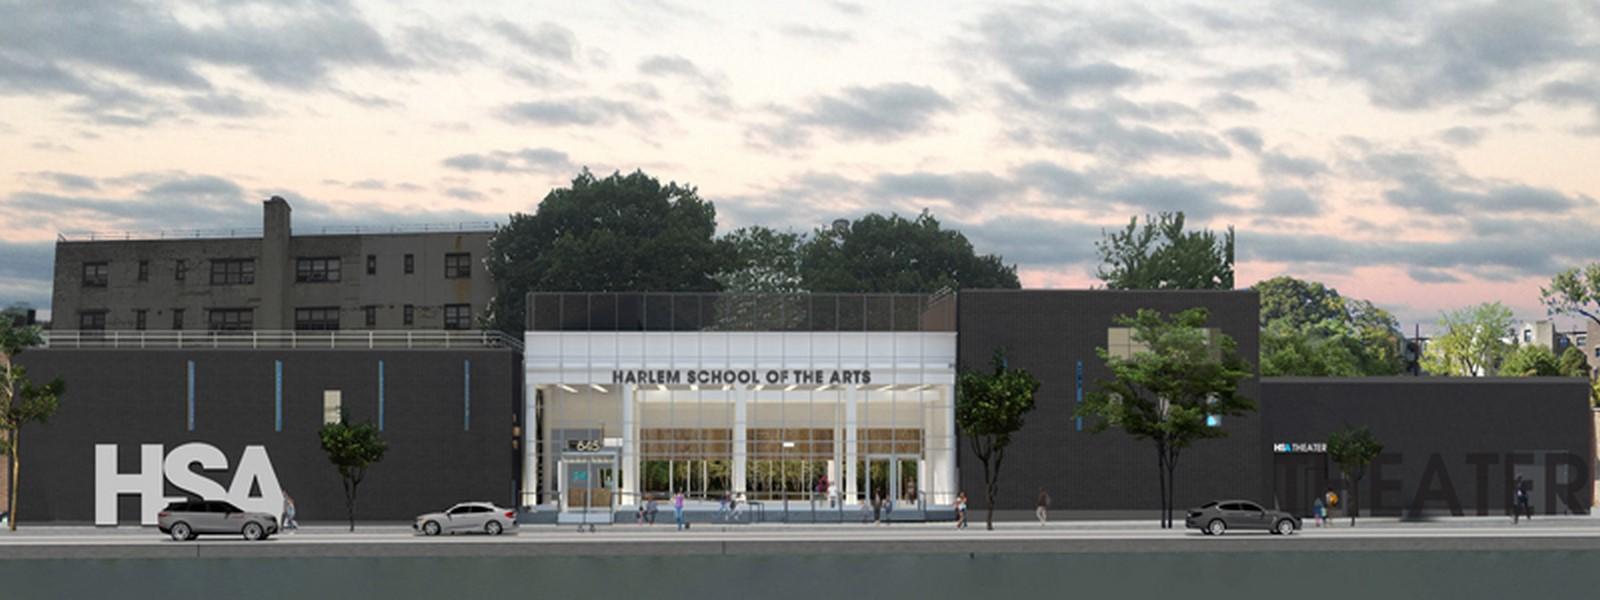 Harlem School of Arts, New York - Sheet2